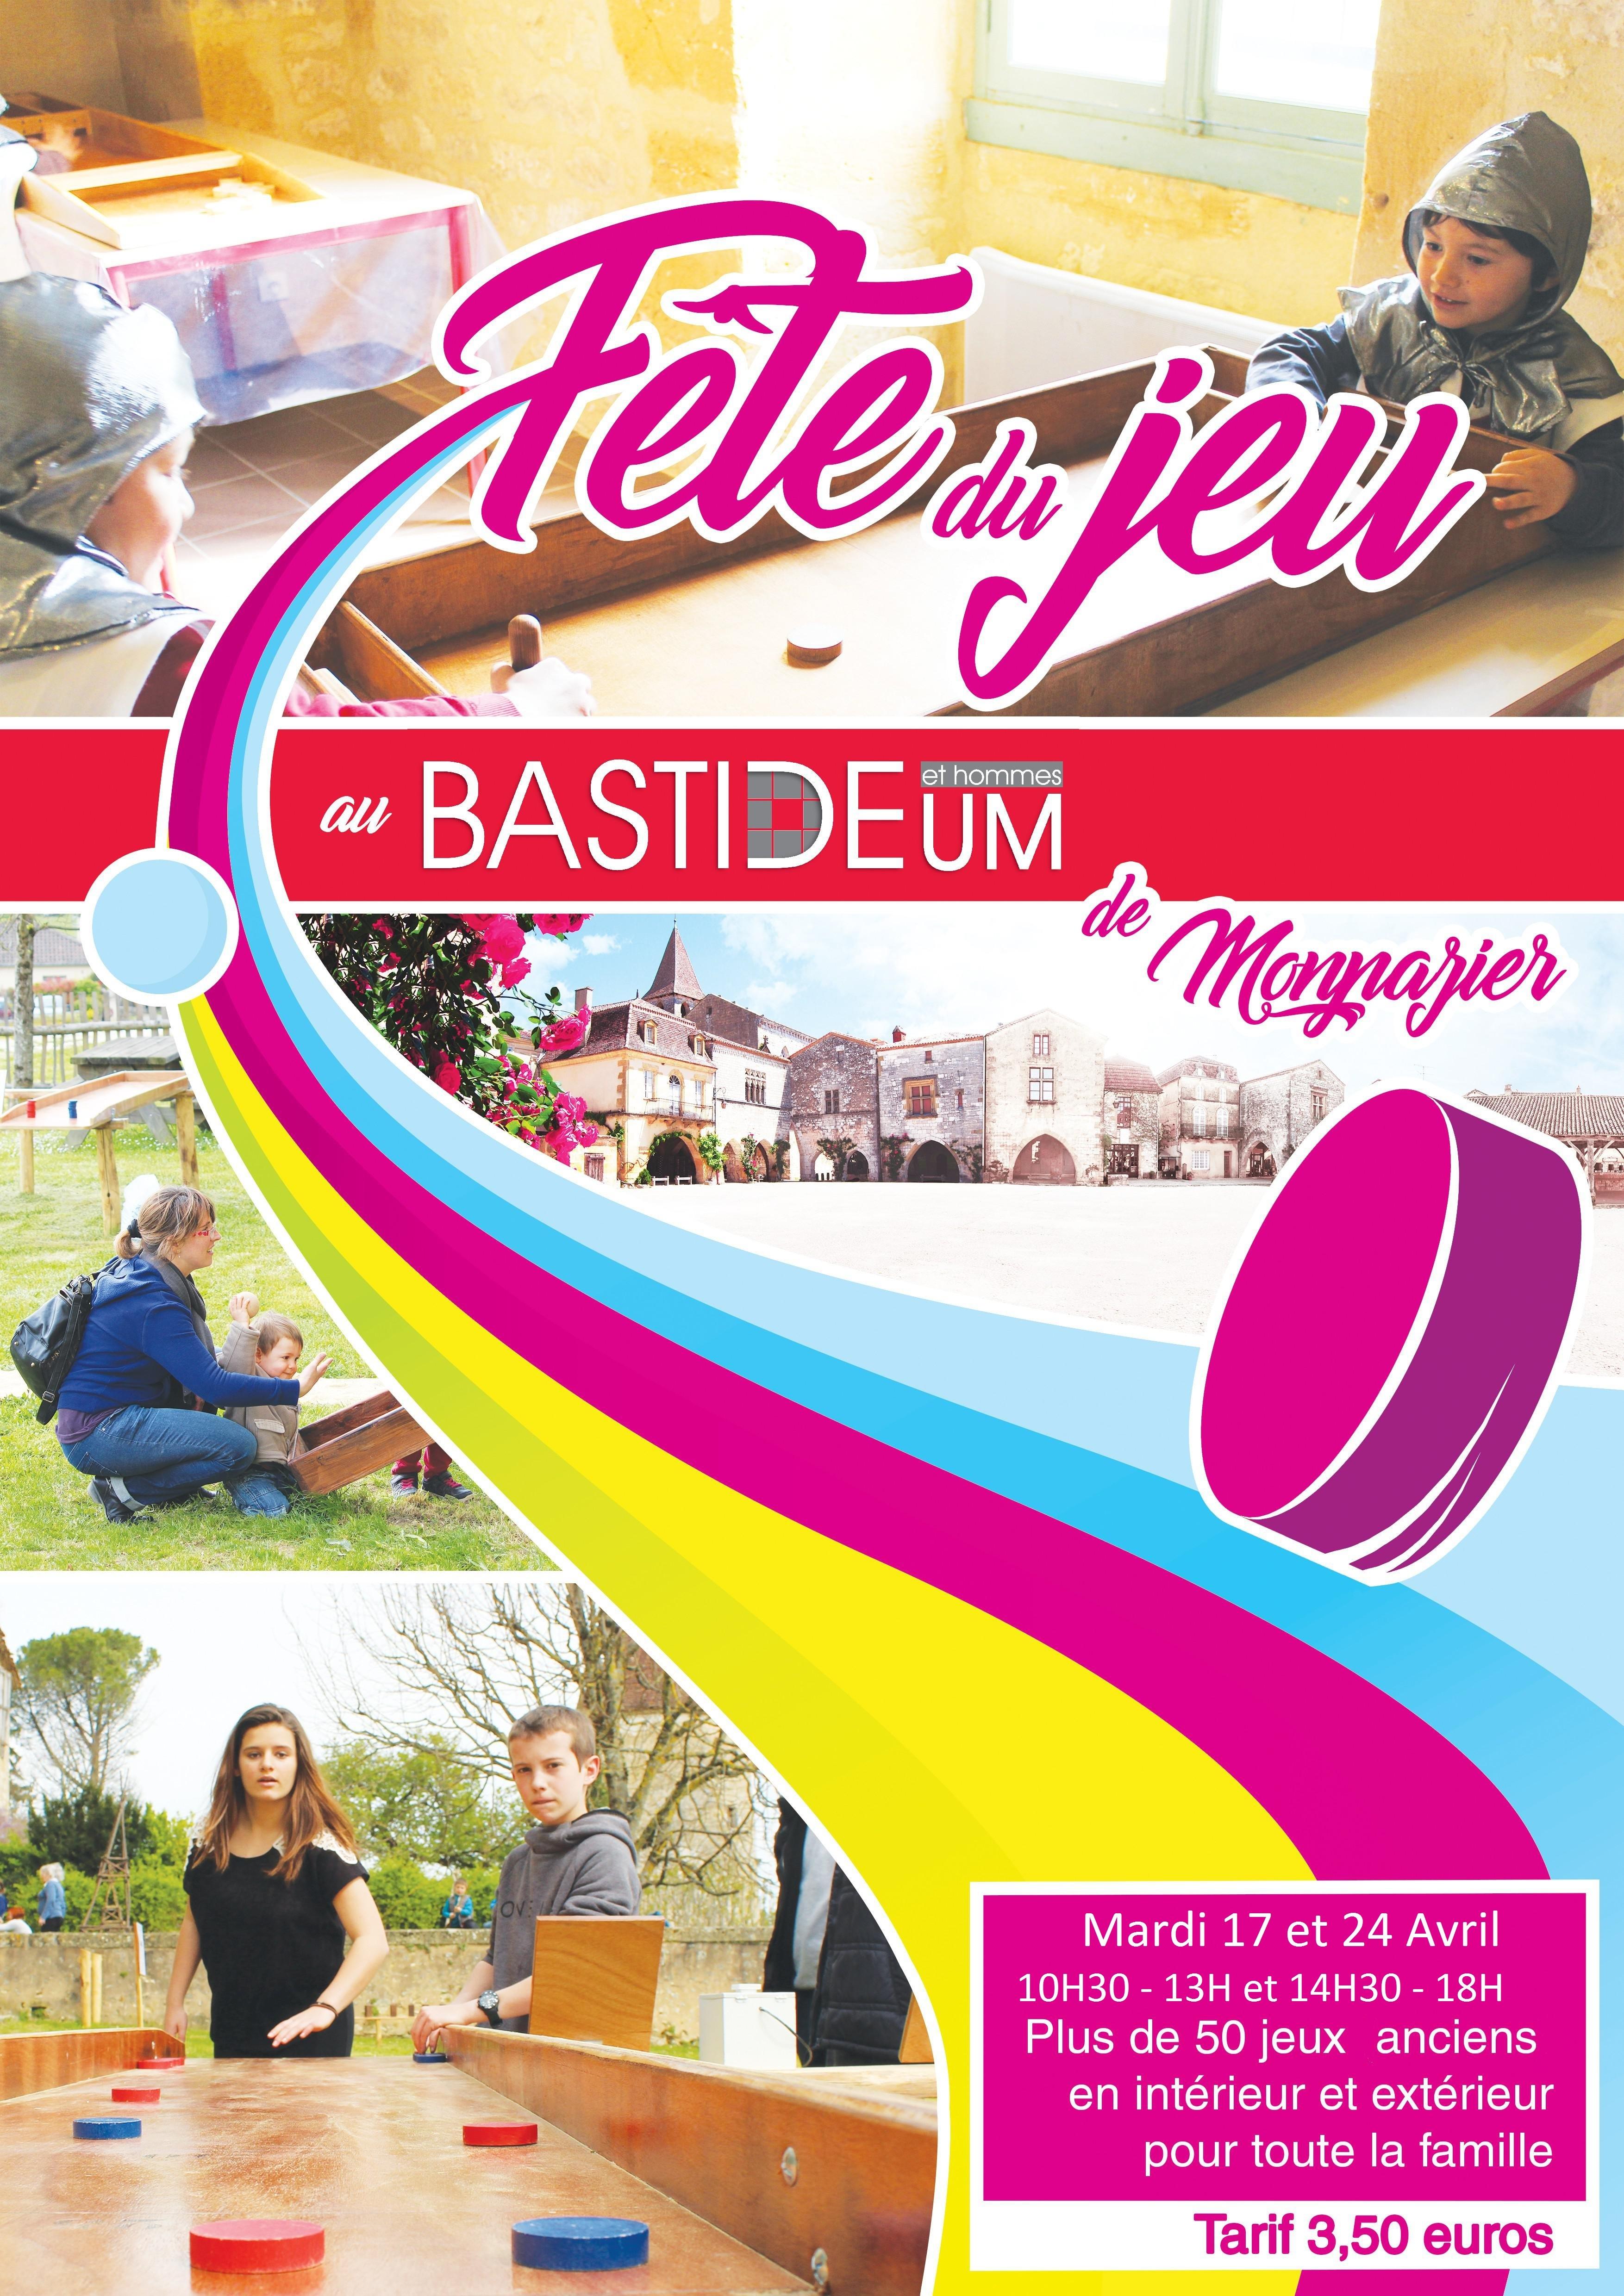 Bastideum - Fête du Jeu